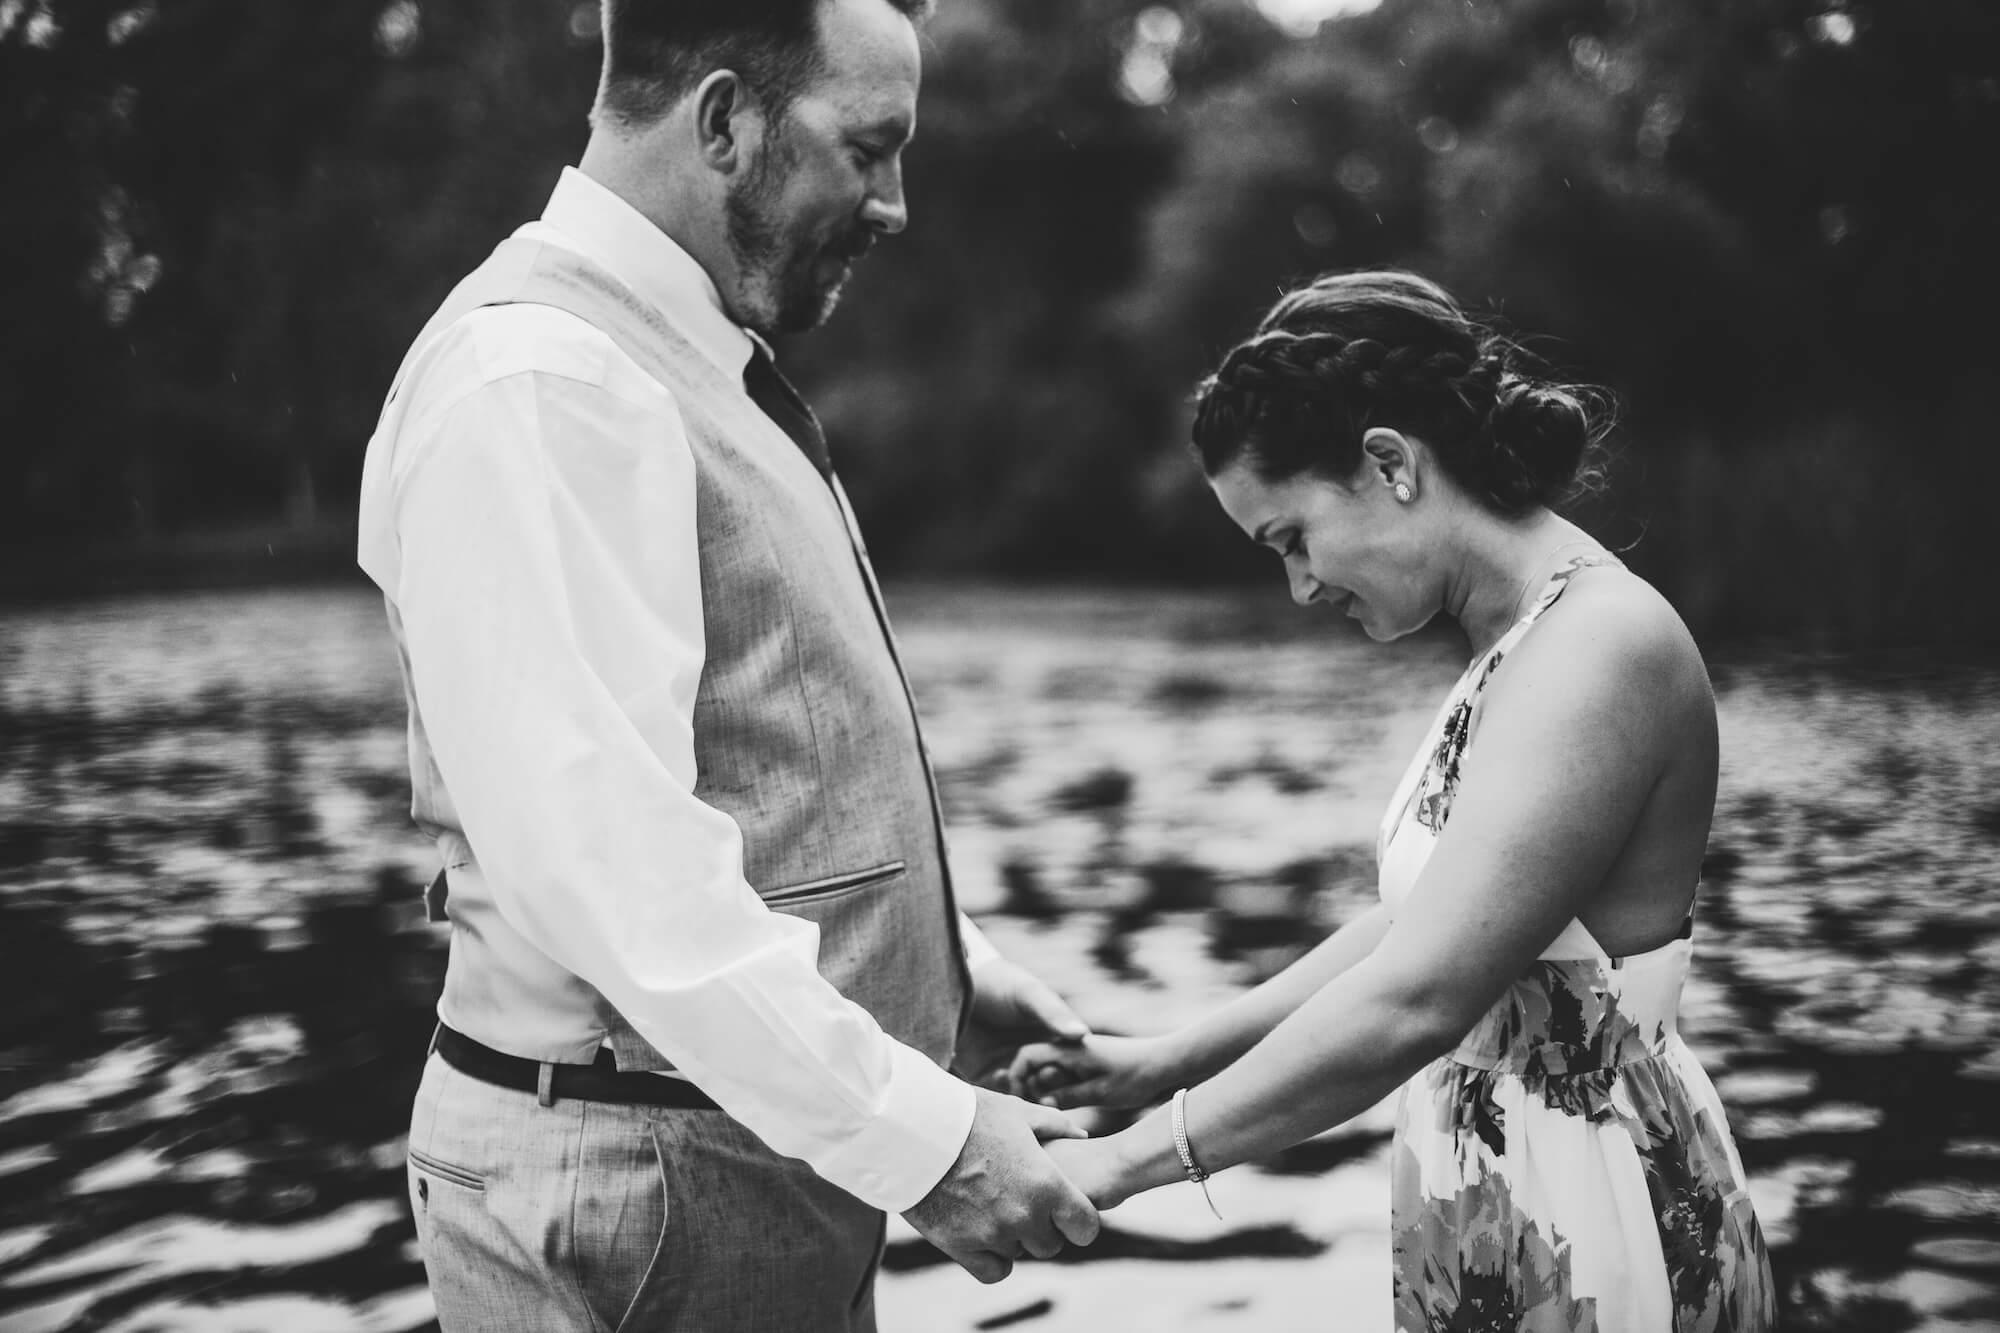 engle-olson-maddy-pat-mn-wedding-photography-10.jpg